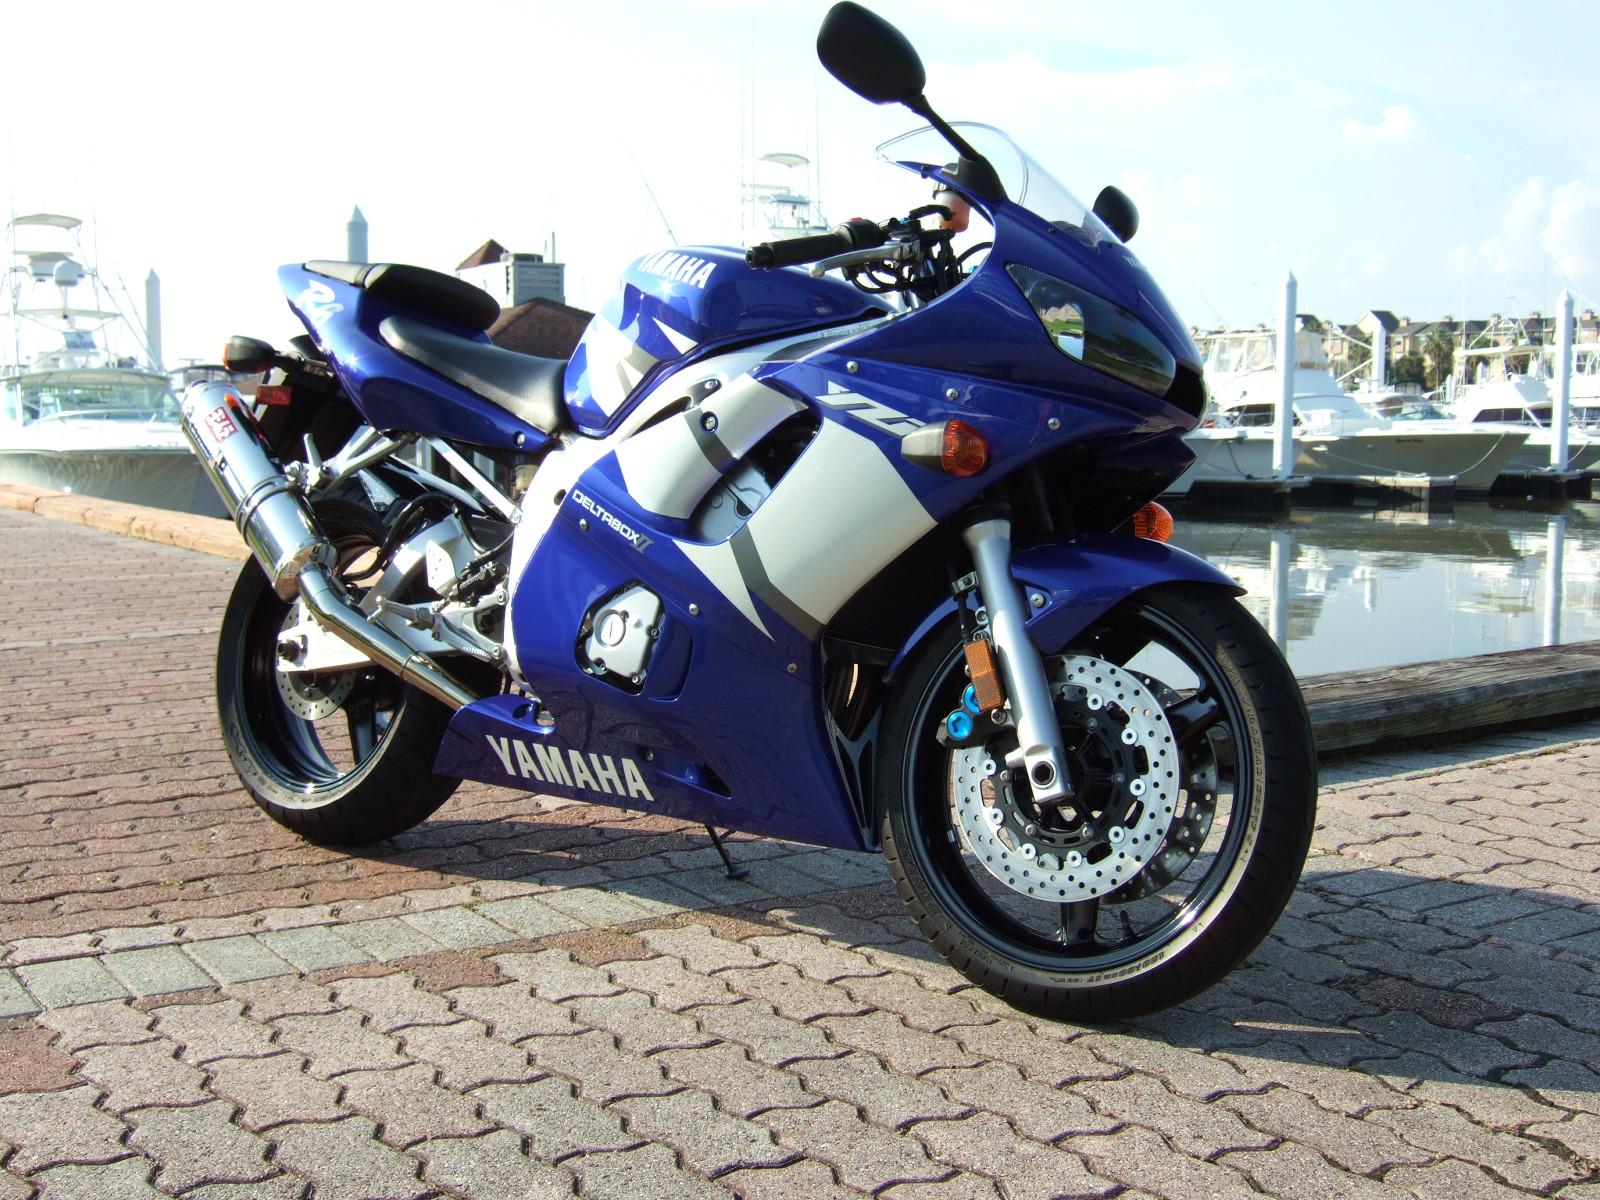 2002 Yamaha R6 - Flawless - 2400 Miles